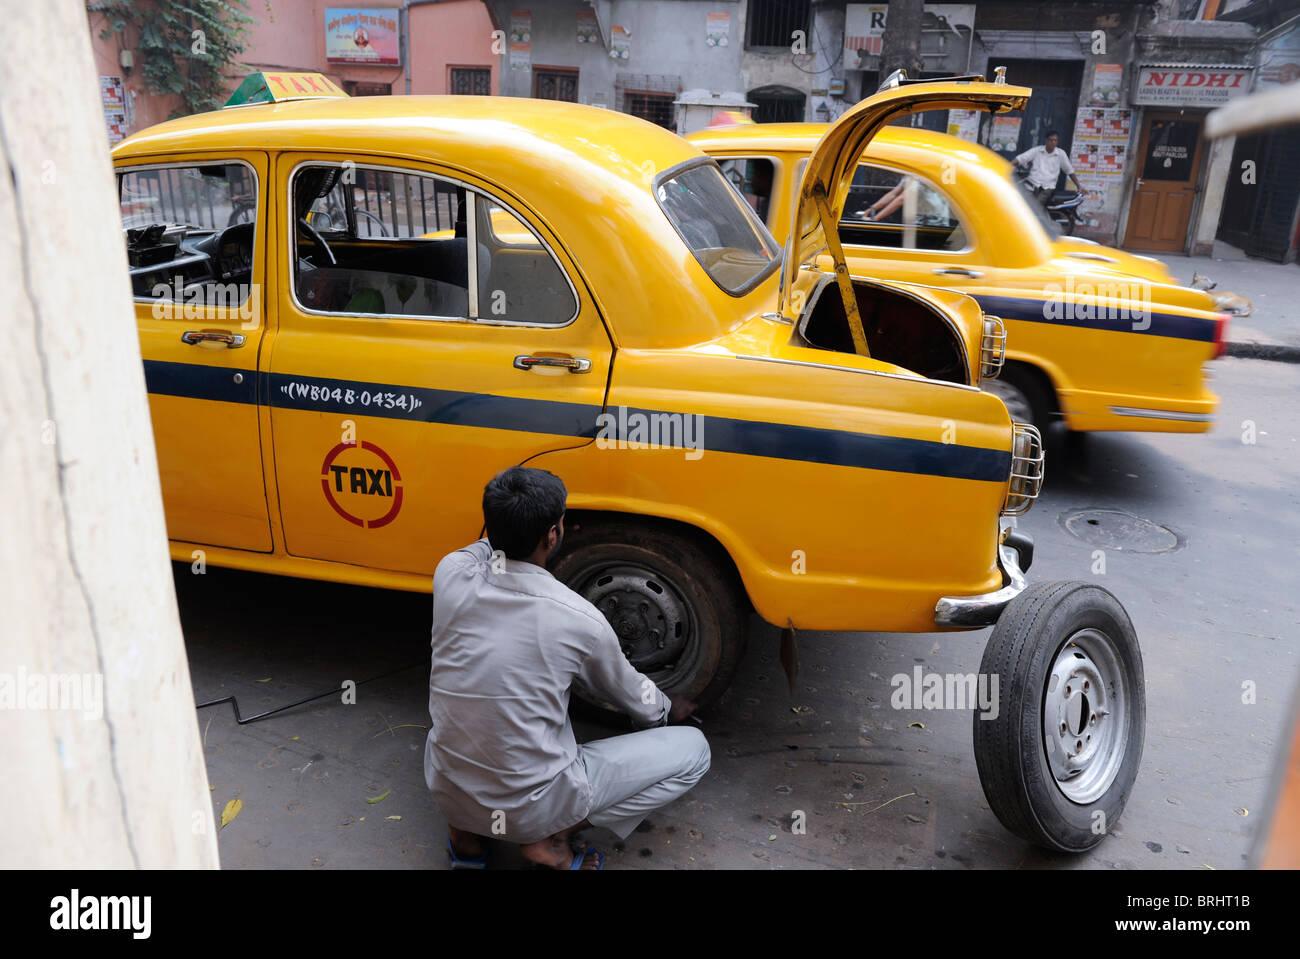 Asia meridional India CALCUTA Calcuta , taxista reparar un coche , Embajador de la cabina que está basado en Imagen De Stock